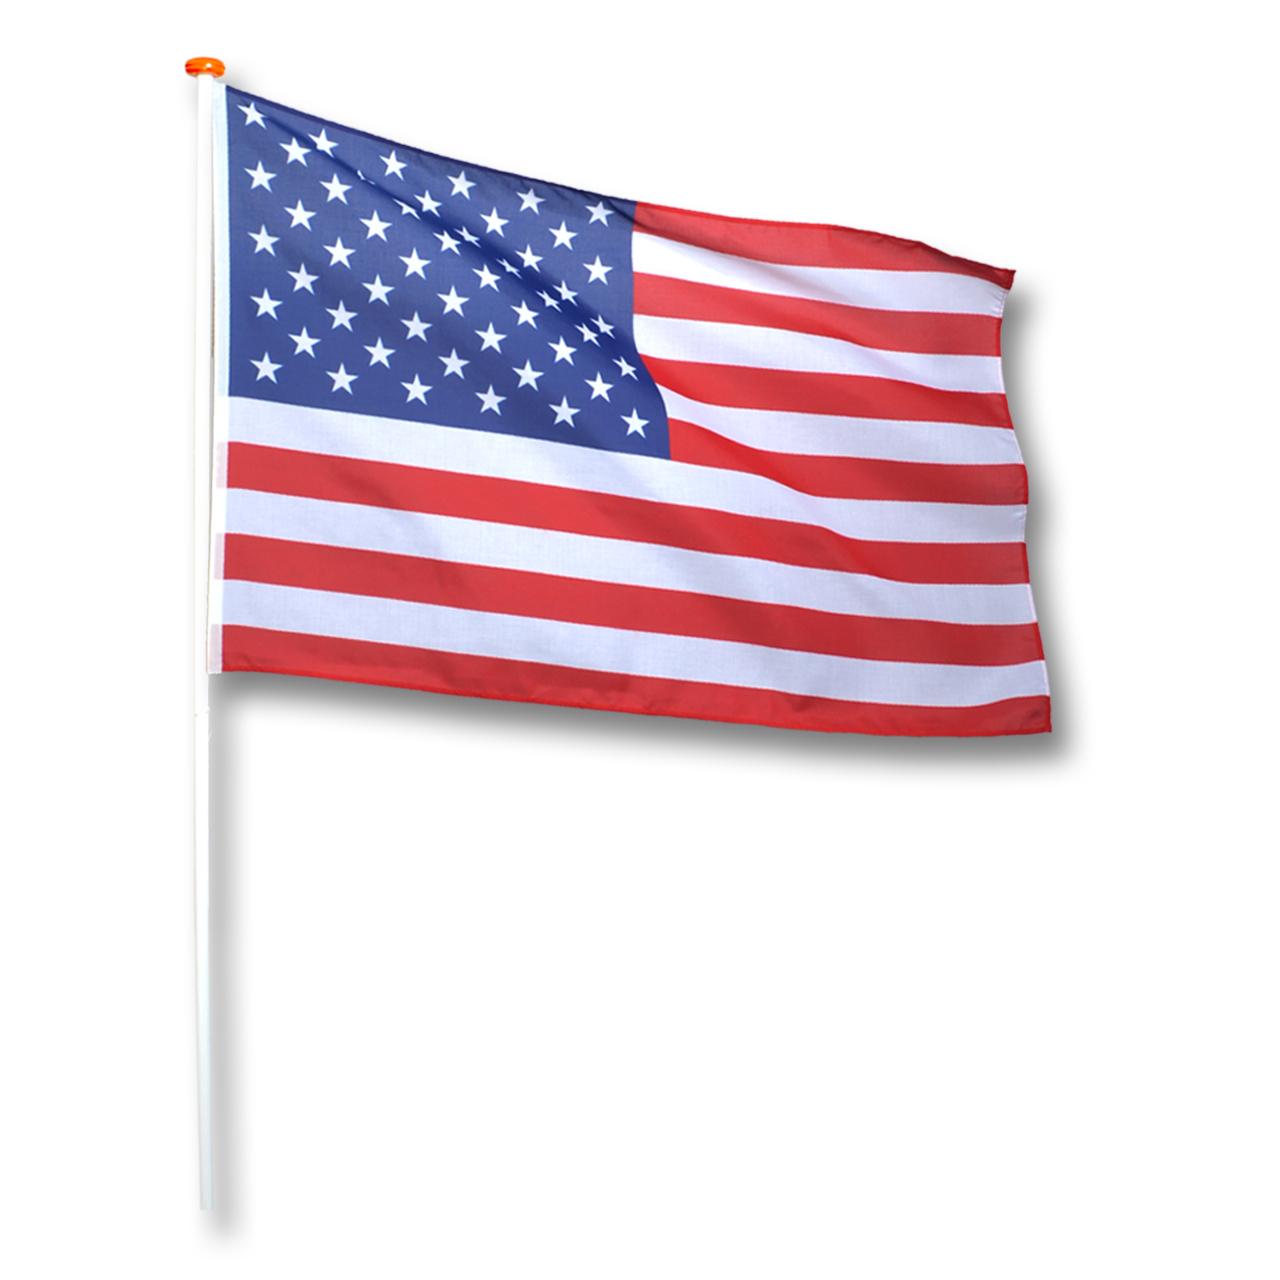 Vlag Amerika (Verenigde Staten van Amerika)